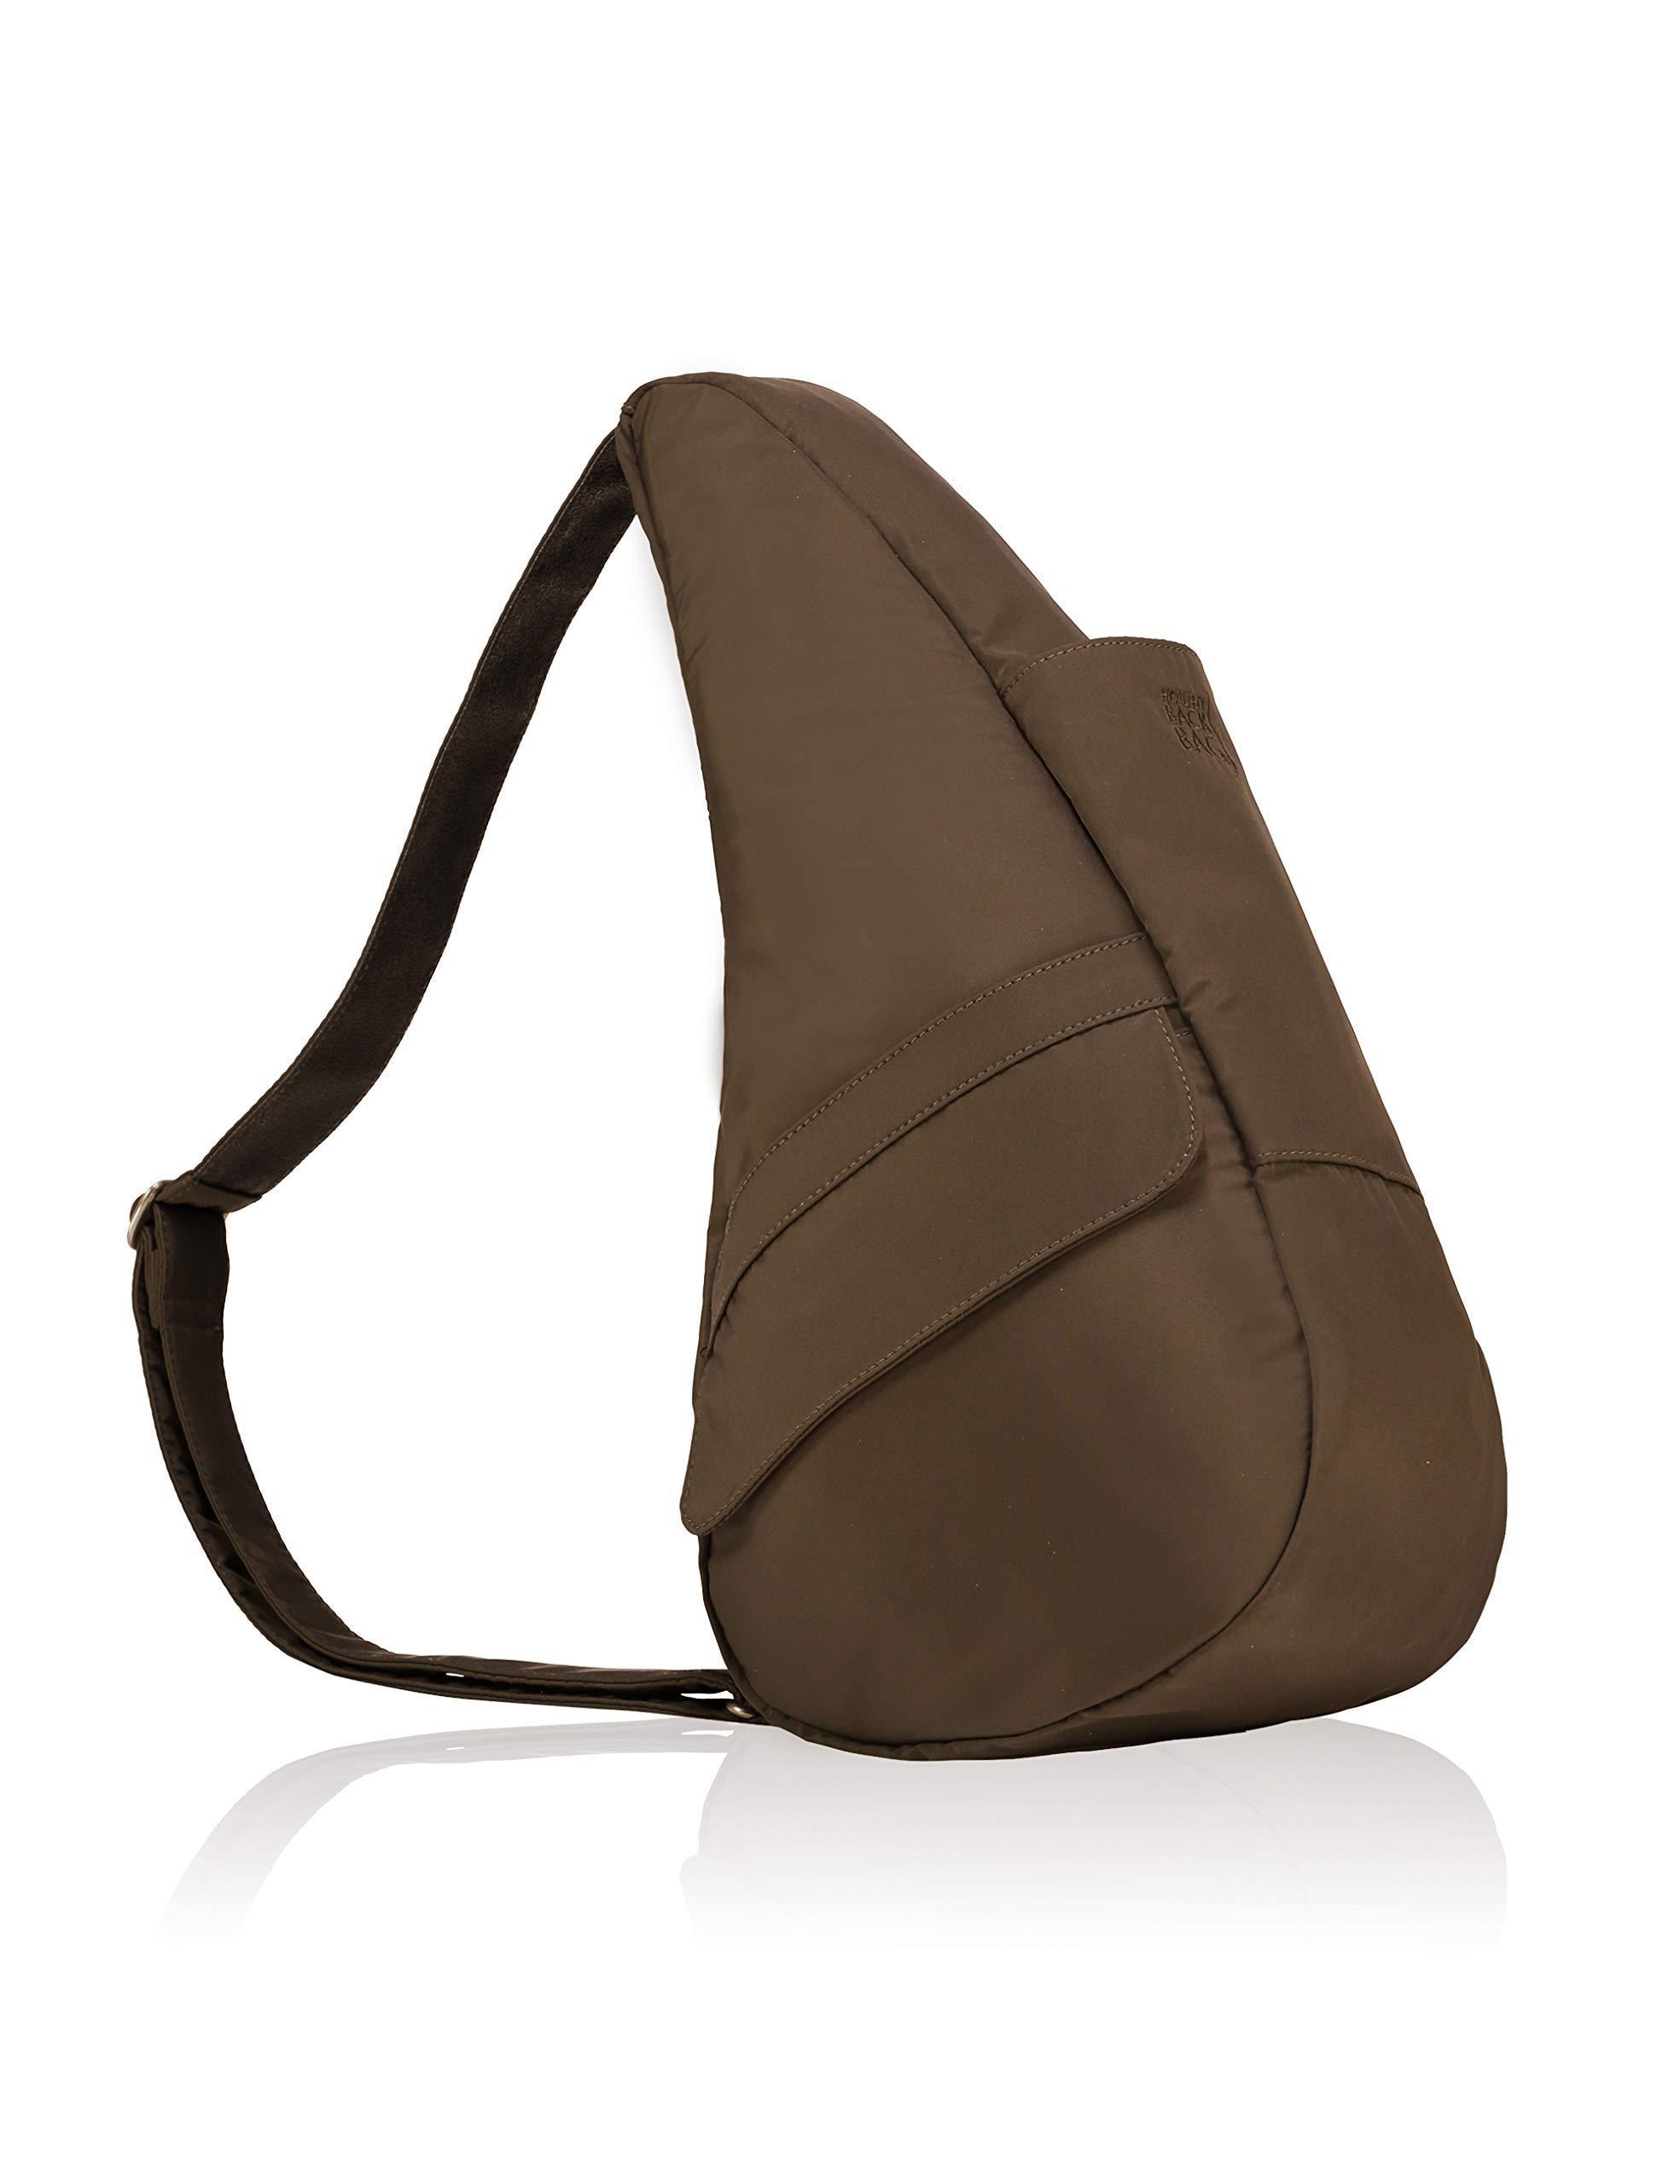 AmeriBag X-Small Microfiber Healthy Back Bag